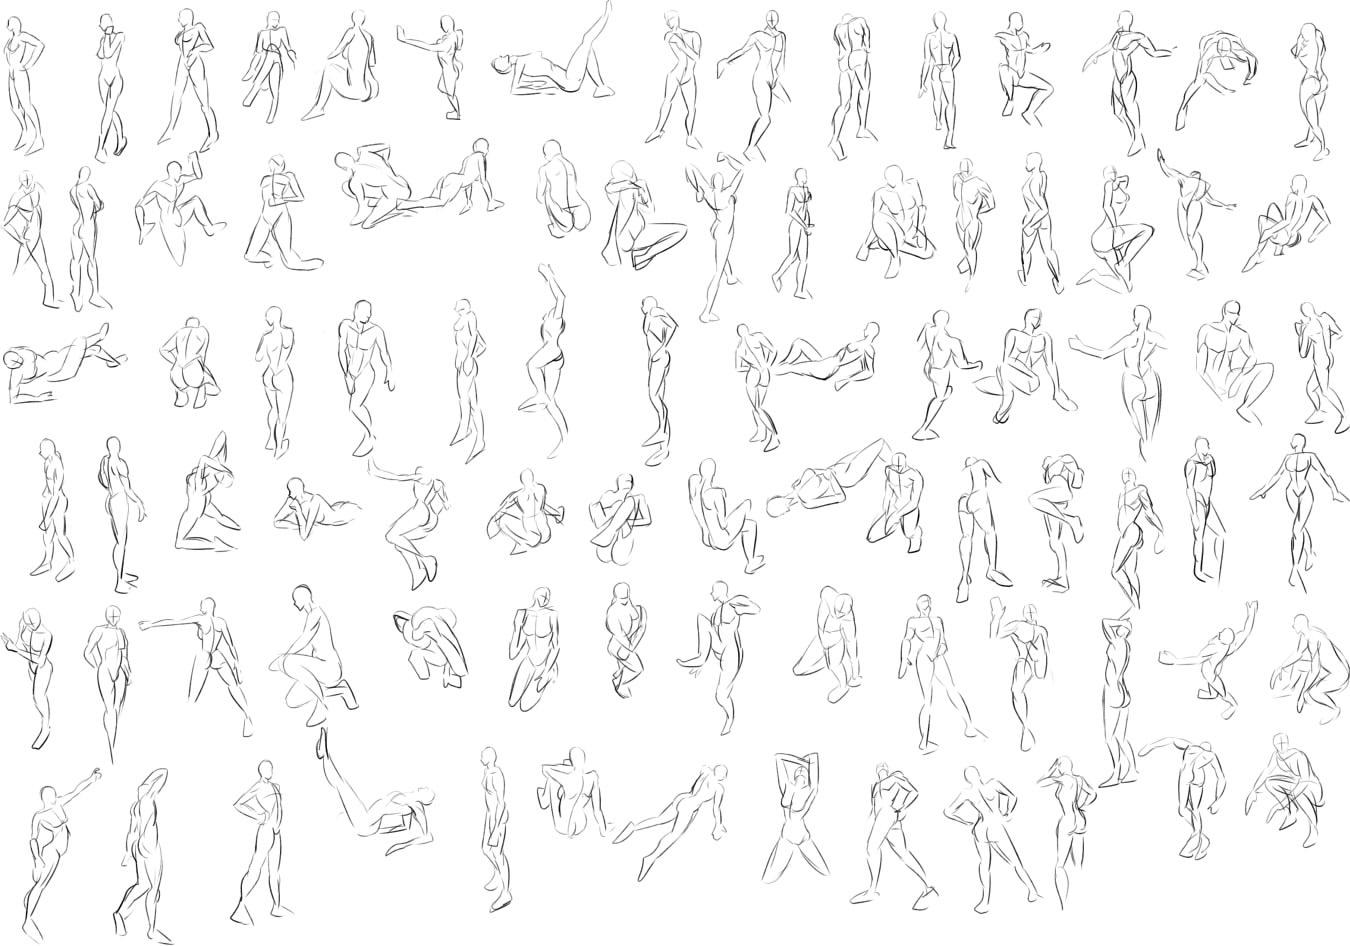 drawing30_13.jpg